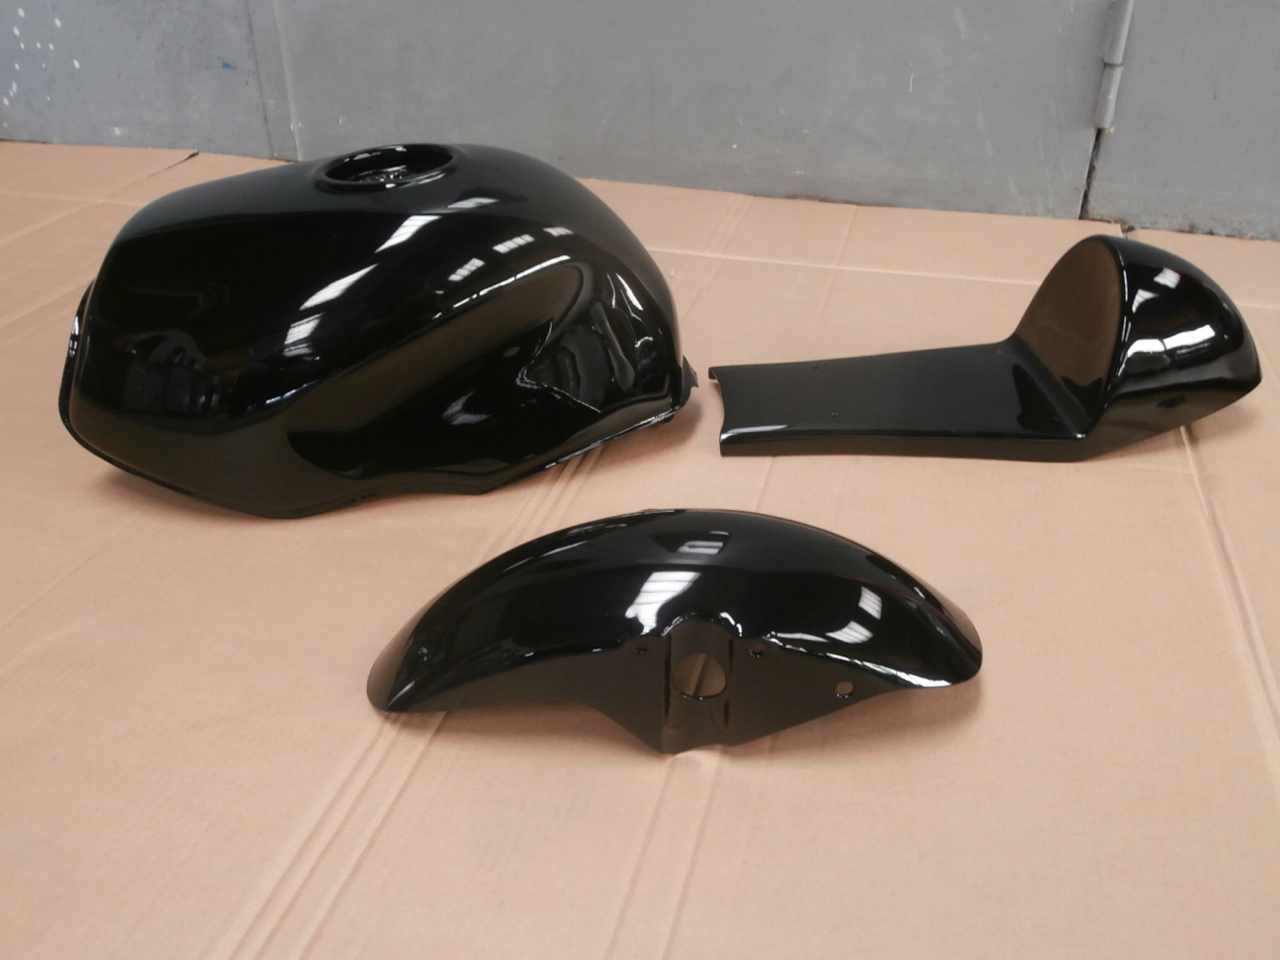 moto custom carrosserierouillard. Black Bedroom Furniture Sets. Home Design Ideas